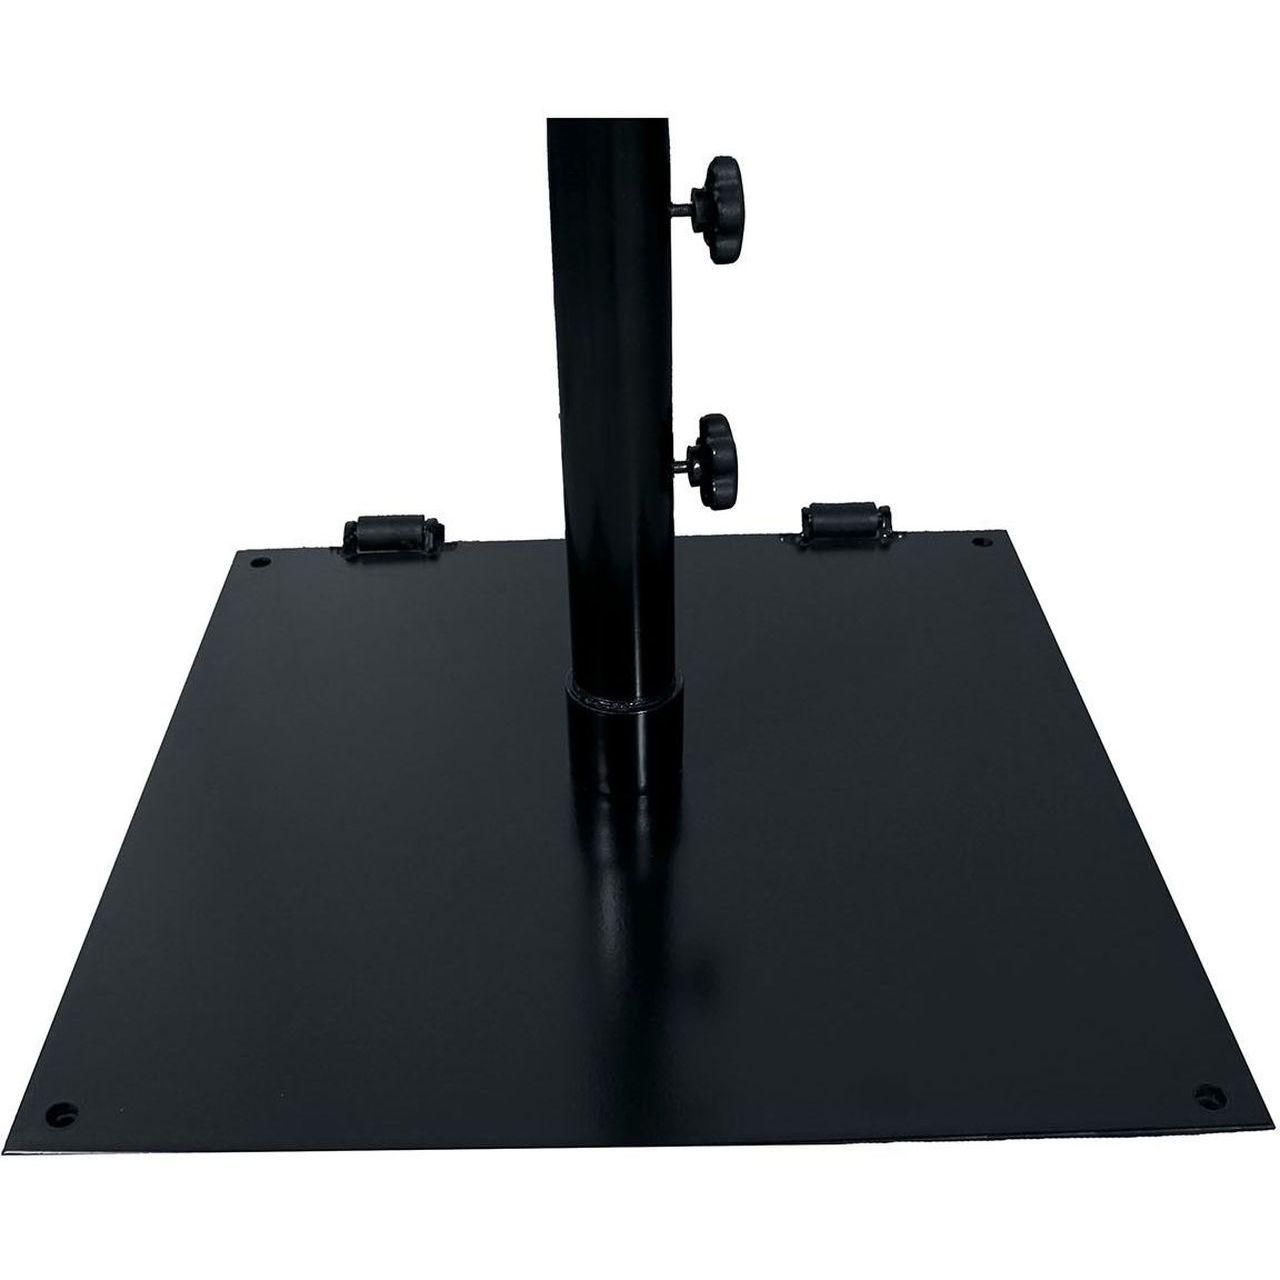 "Grosfillex Flat 24"" Square Umbrella Base in Black"